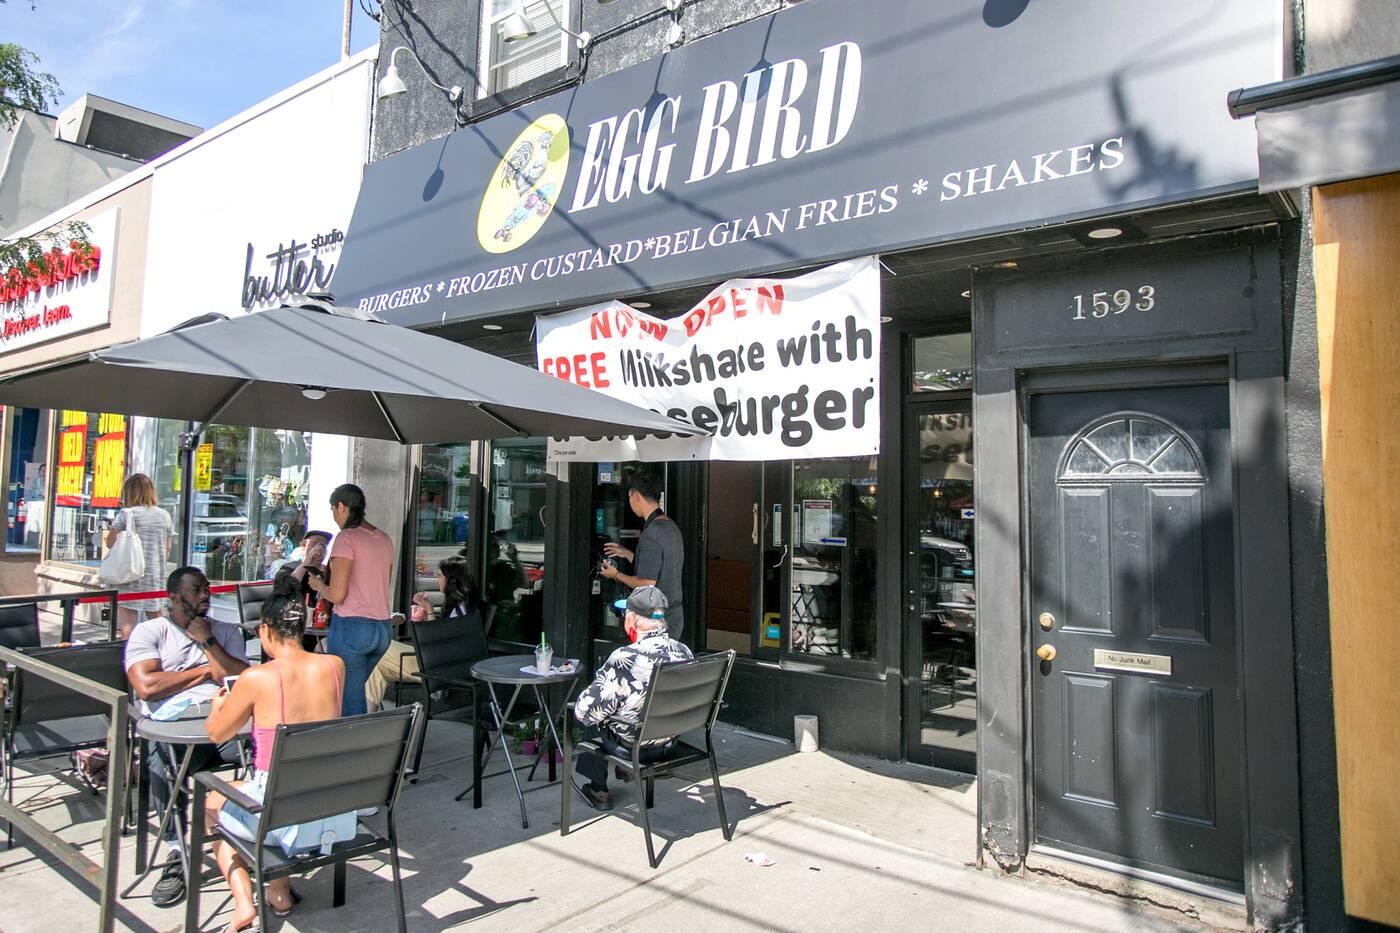 Egg Bird Toronto